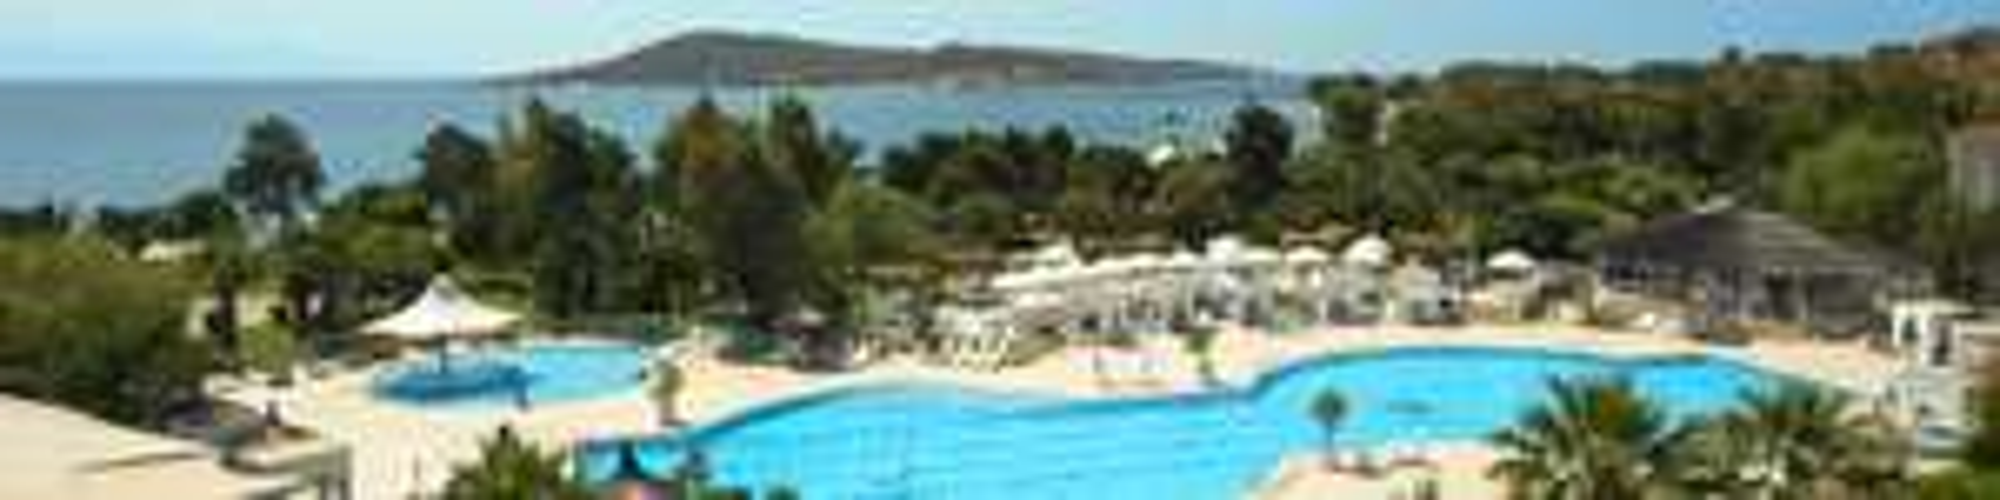 £50 off pp of Phokaia Beach Resort with Code @ Mark Warner Holidays